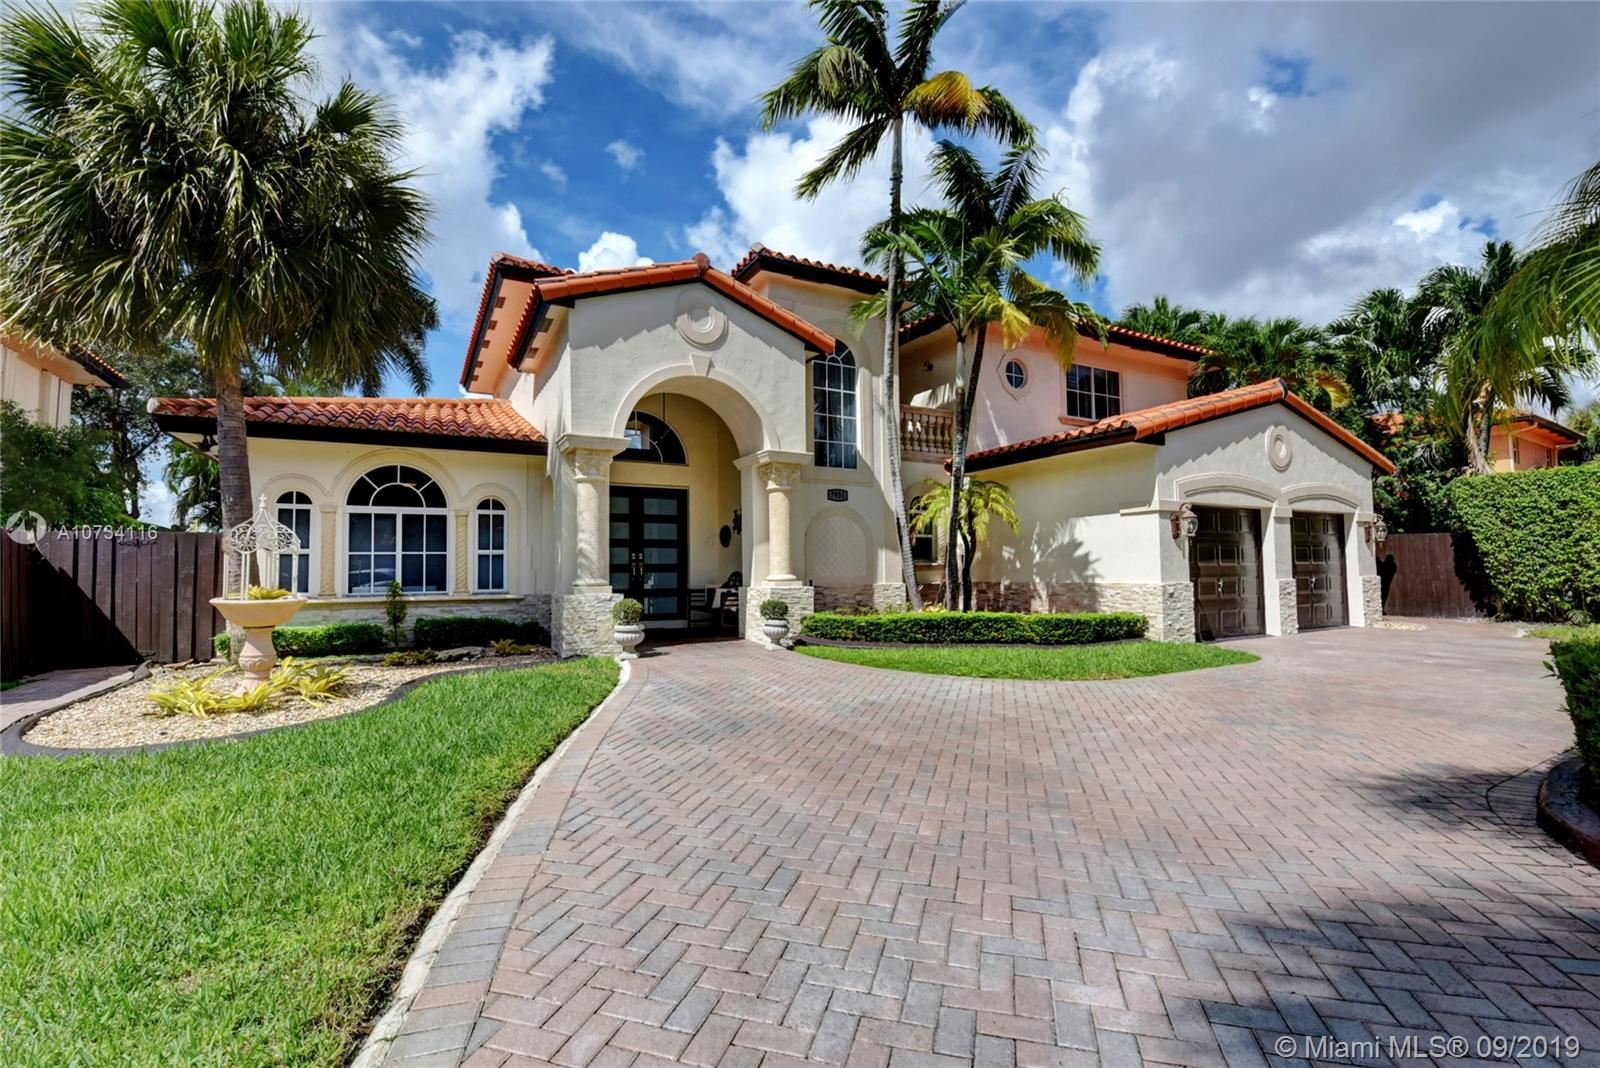 7951 NW 159th Ter, Miami Lakes, FL 33016 - MLS#: A10734116